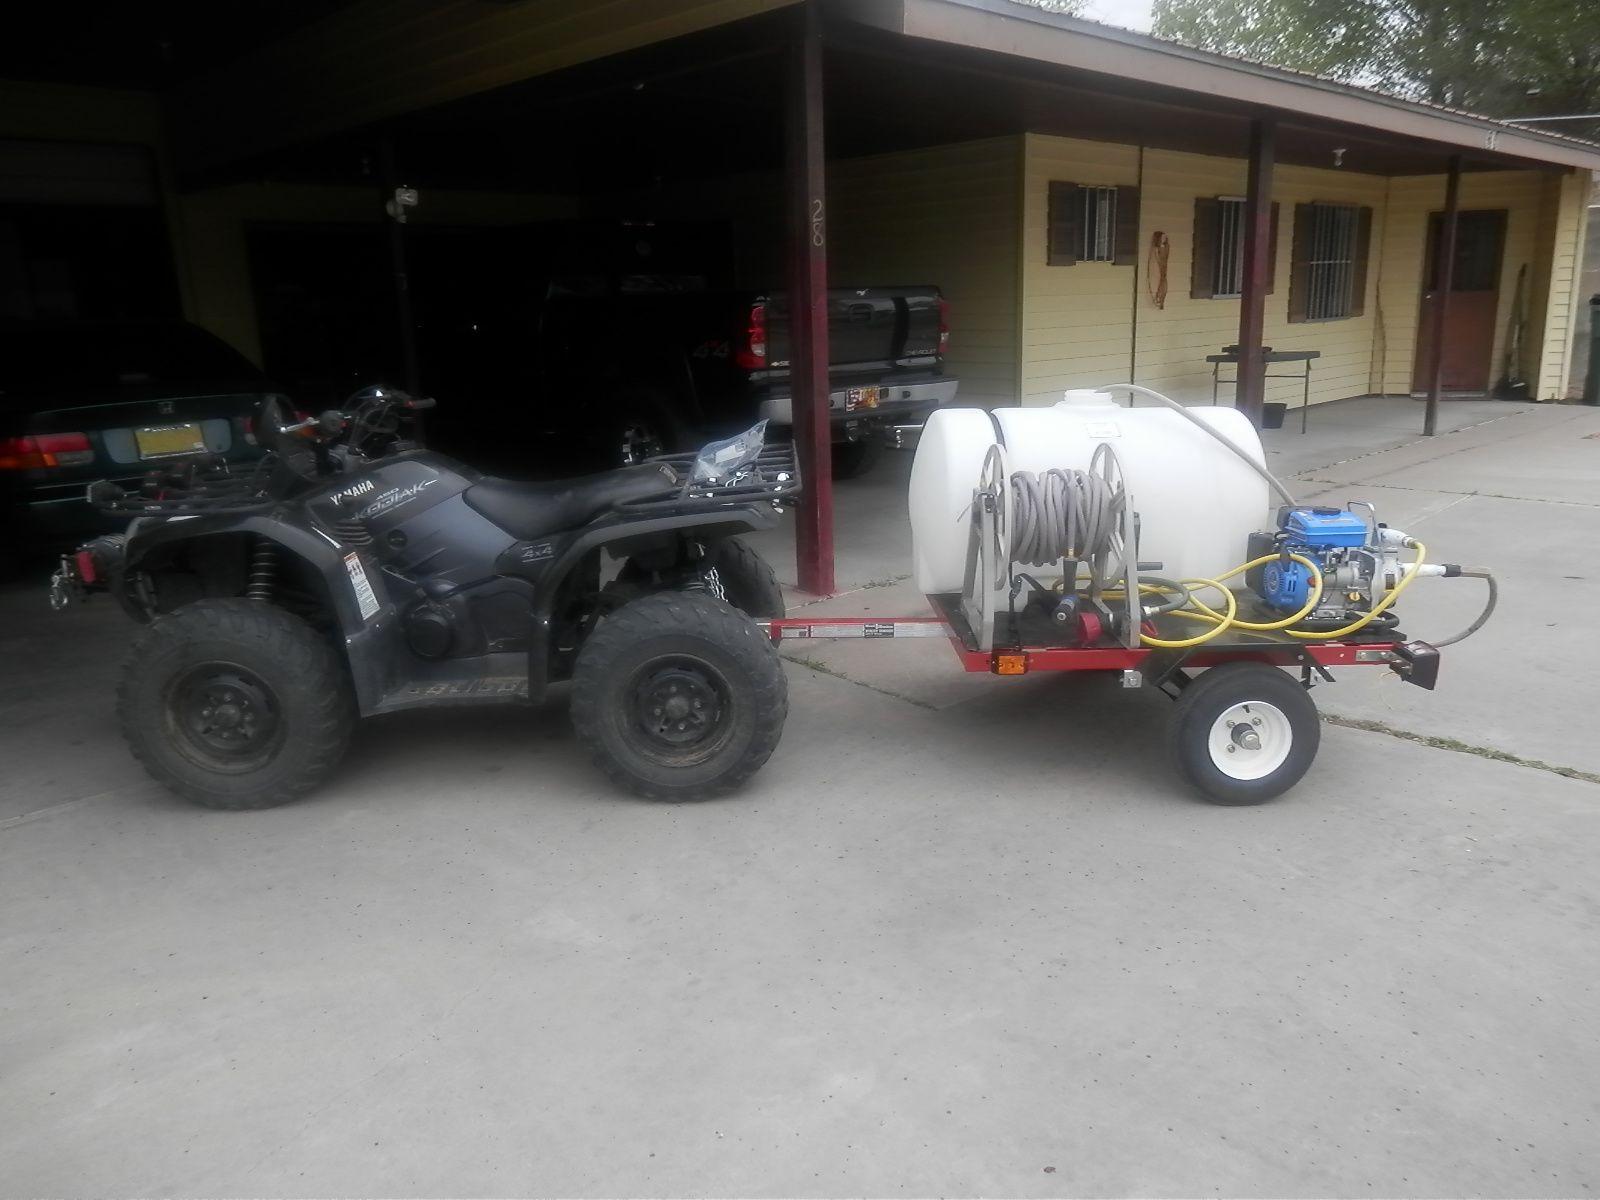 2005 Yamaha Kodiak ATV Pulling Fire Fighting Trailer